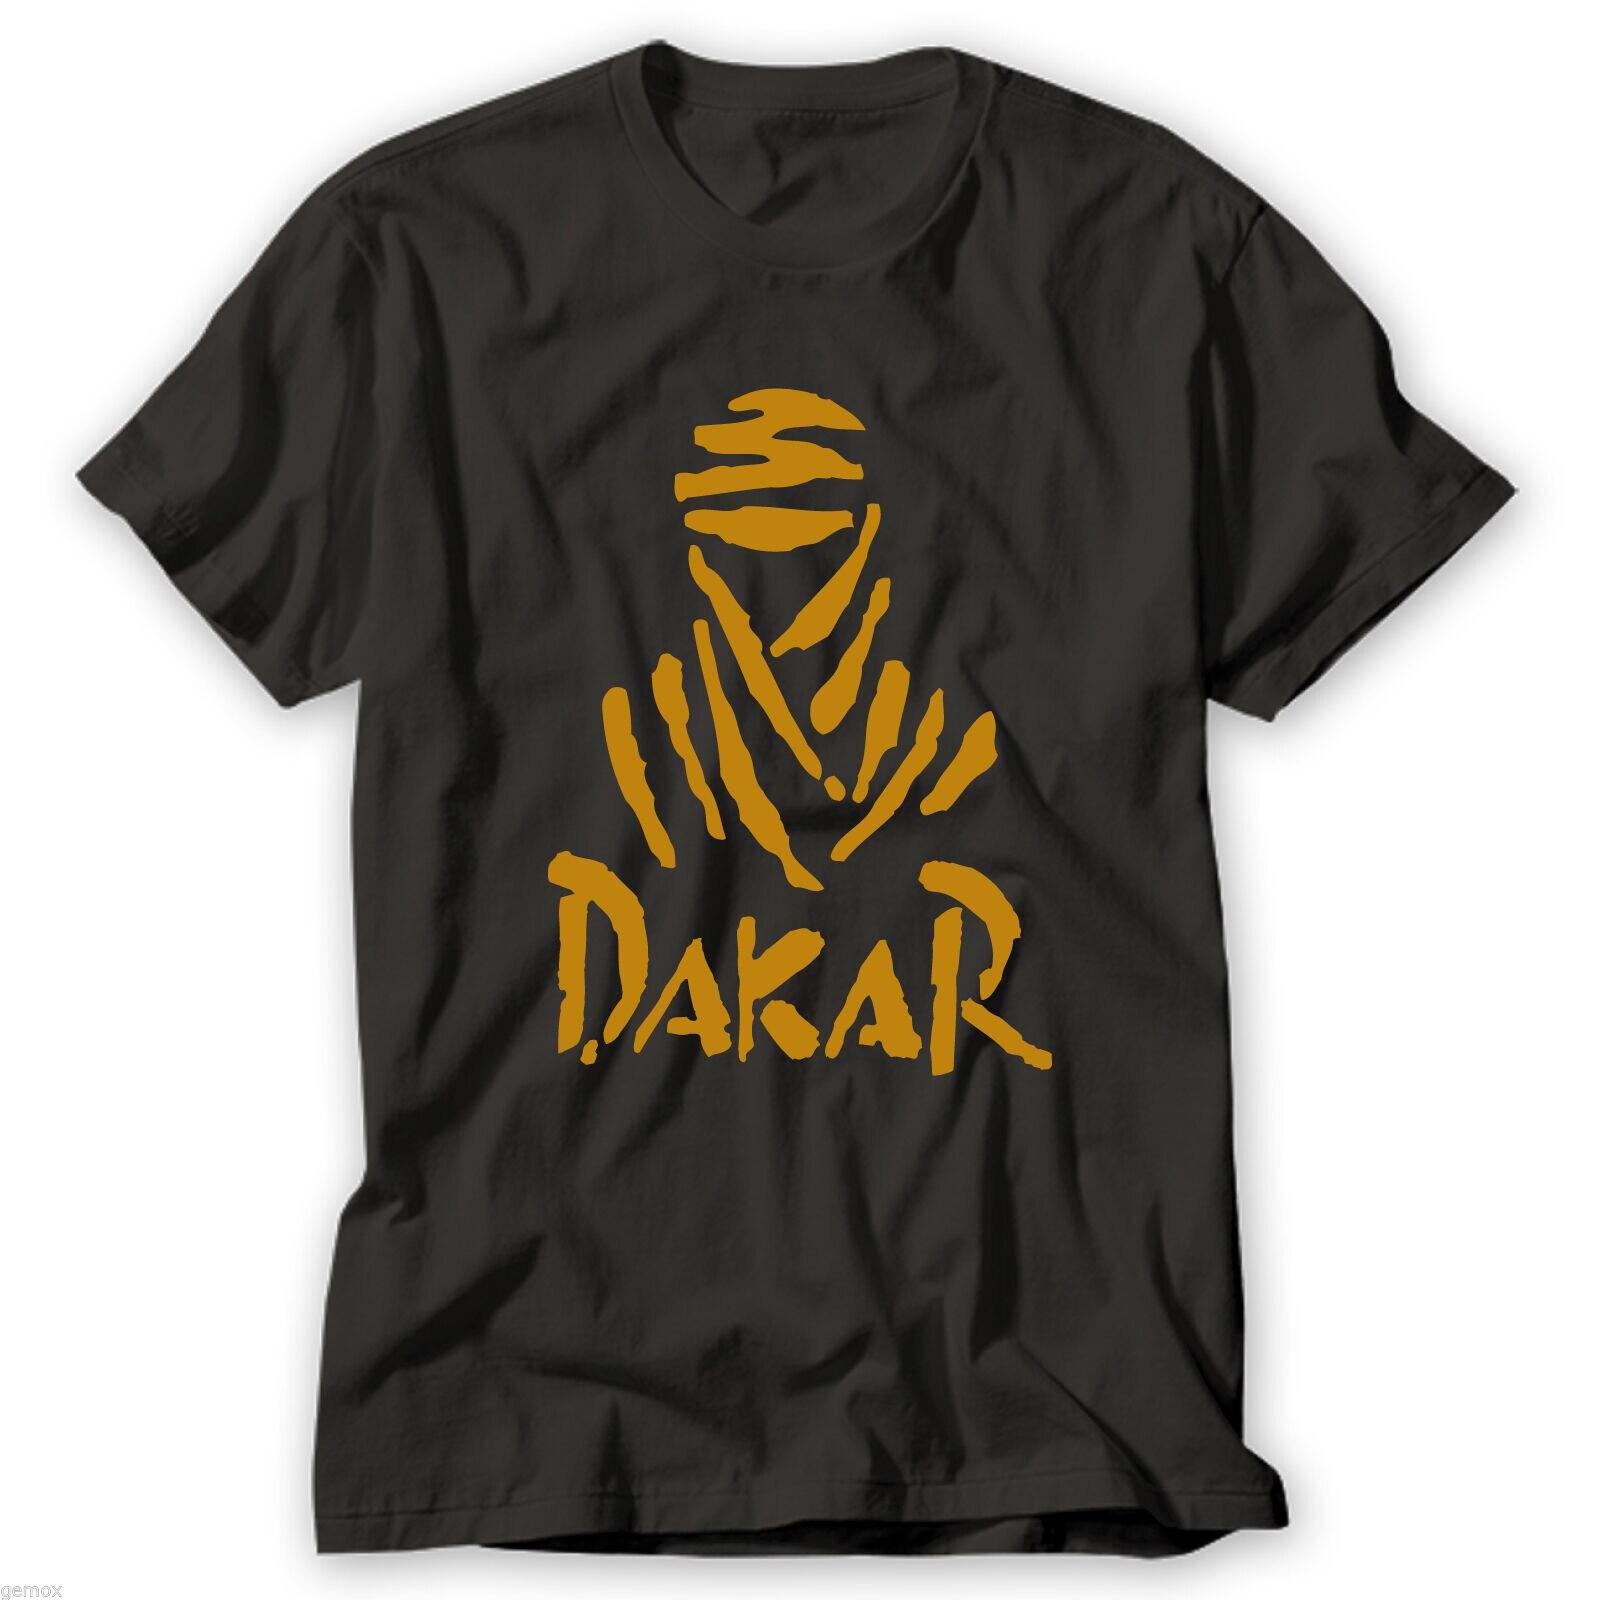 Dakar Rally Off Road T-Shirt Unisex Racing Tee Size S-3Xl